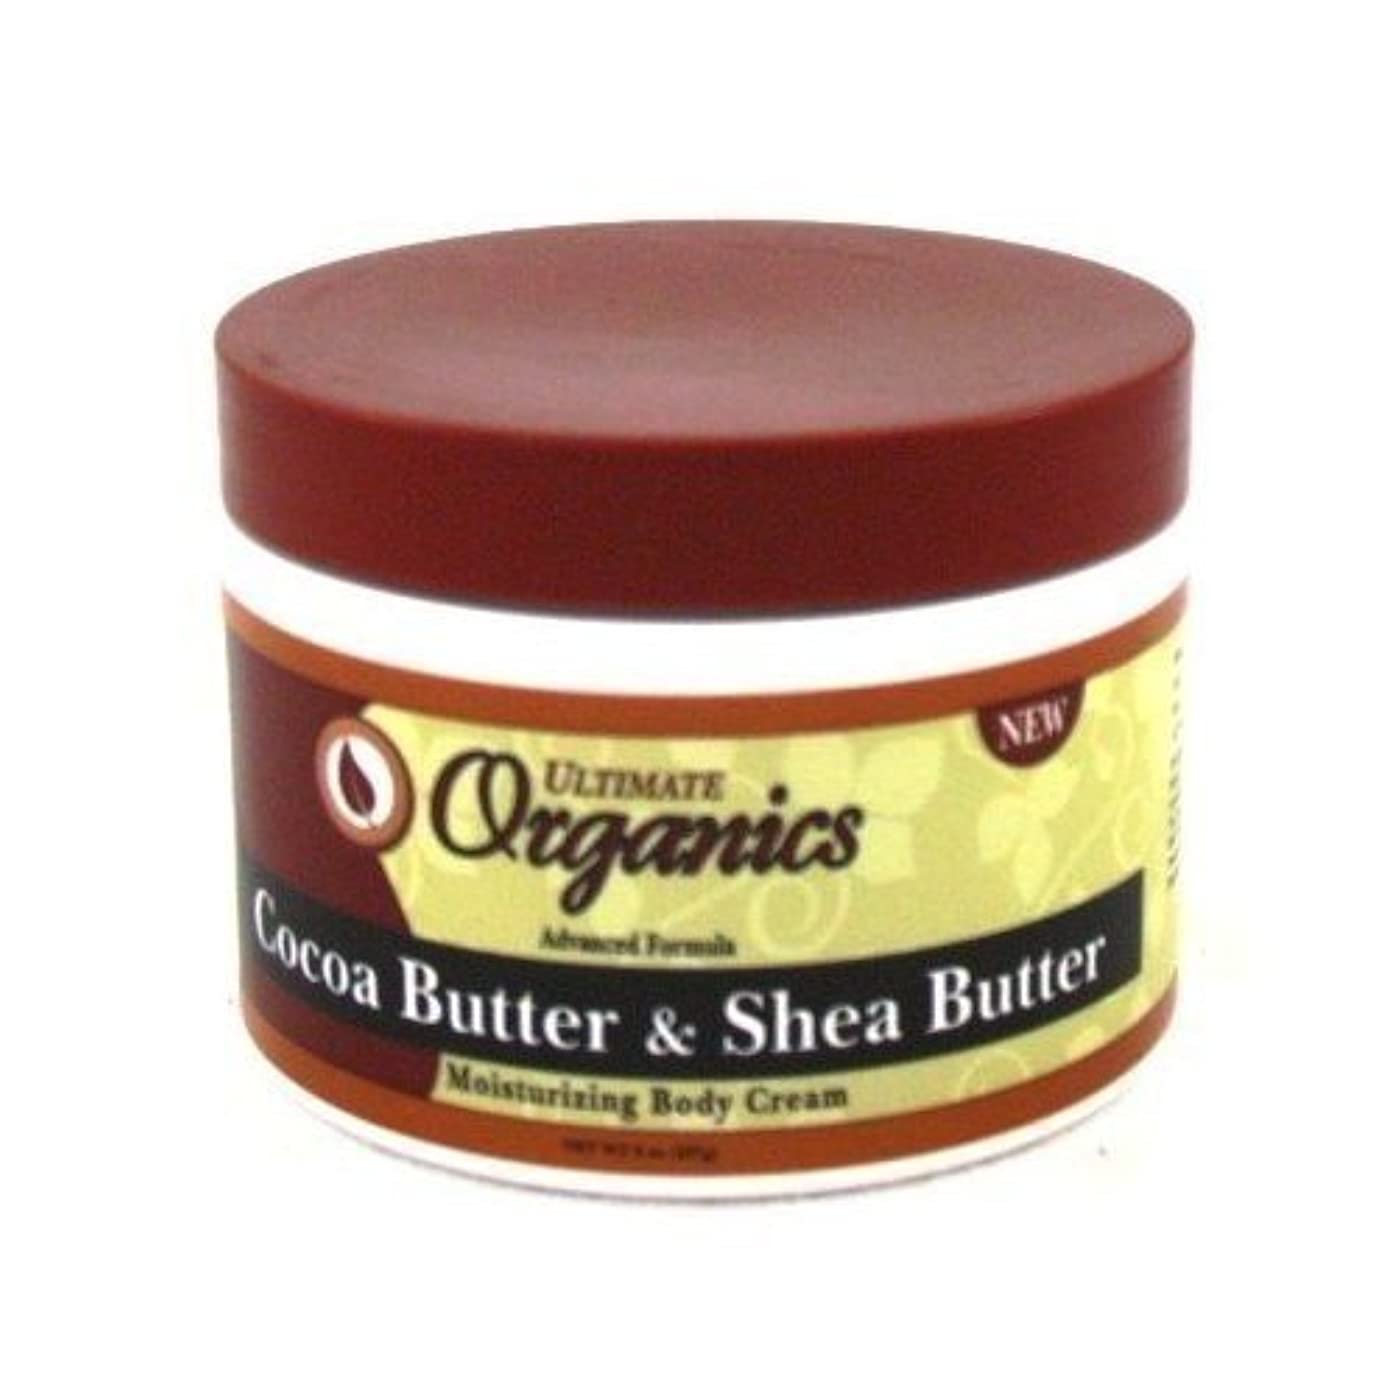 Ultimate Organics Cocoa Butter & Shea Butter Body Cream 235 ml (並行輸入品)